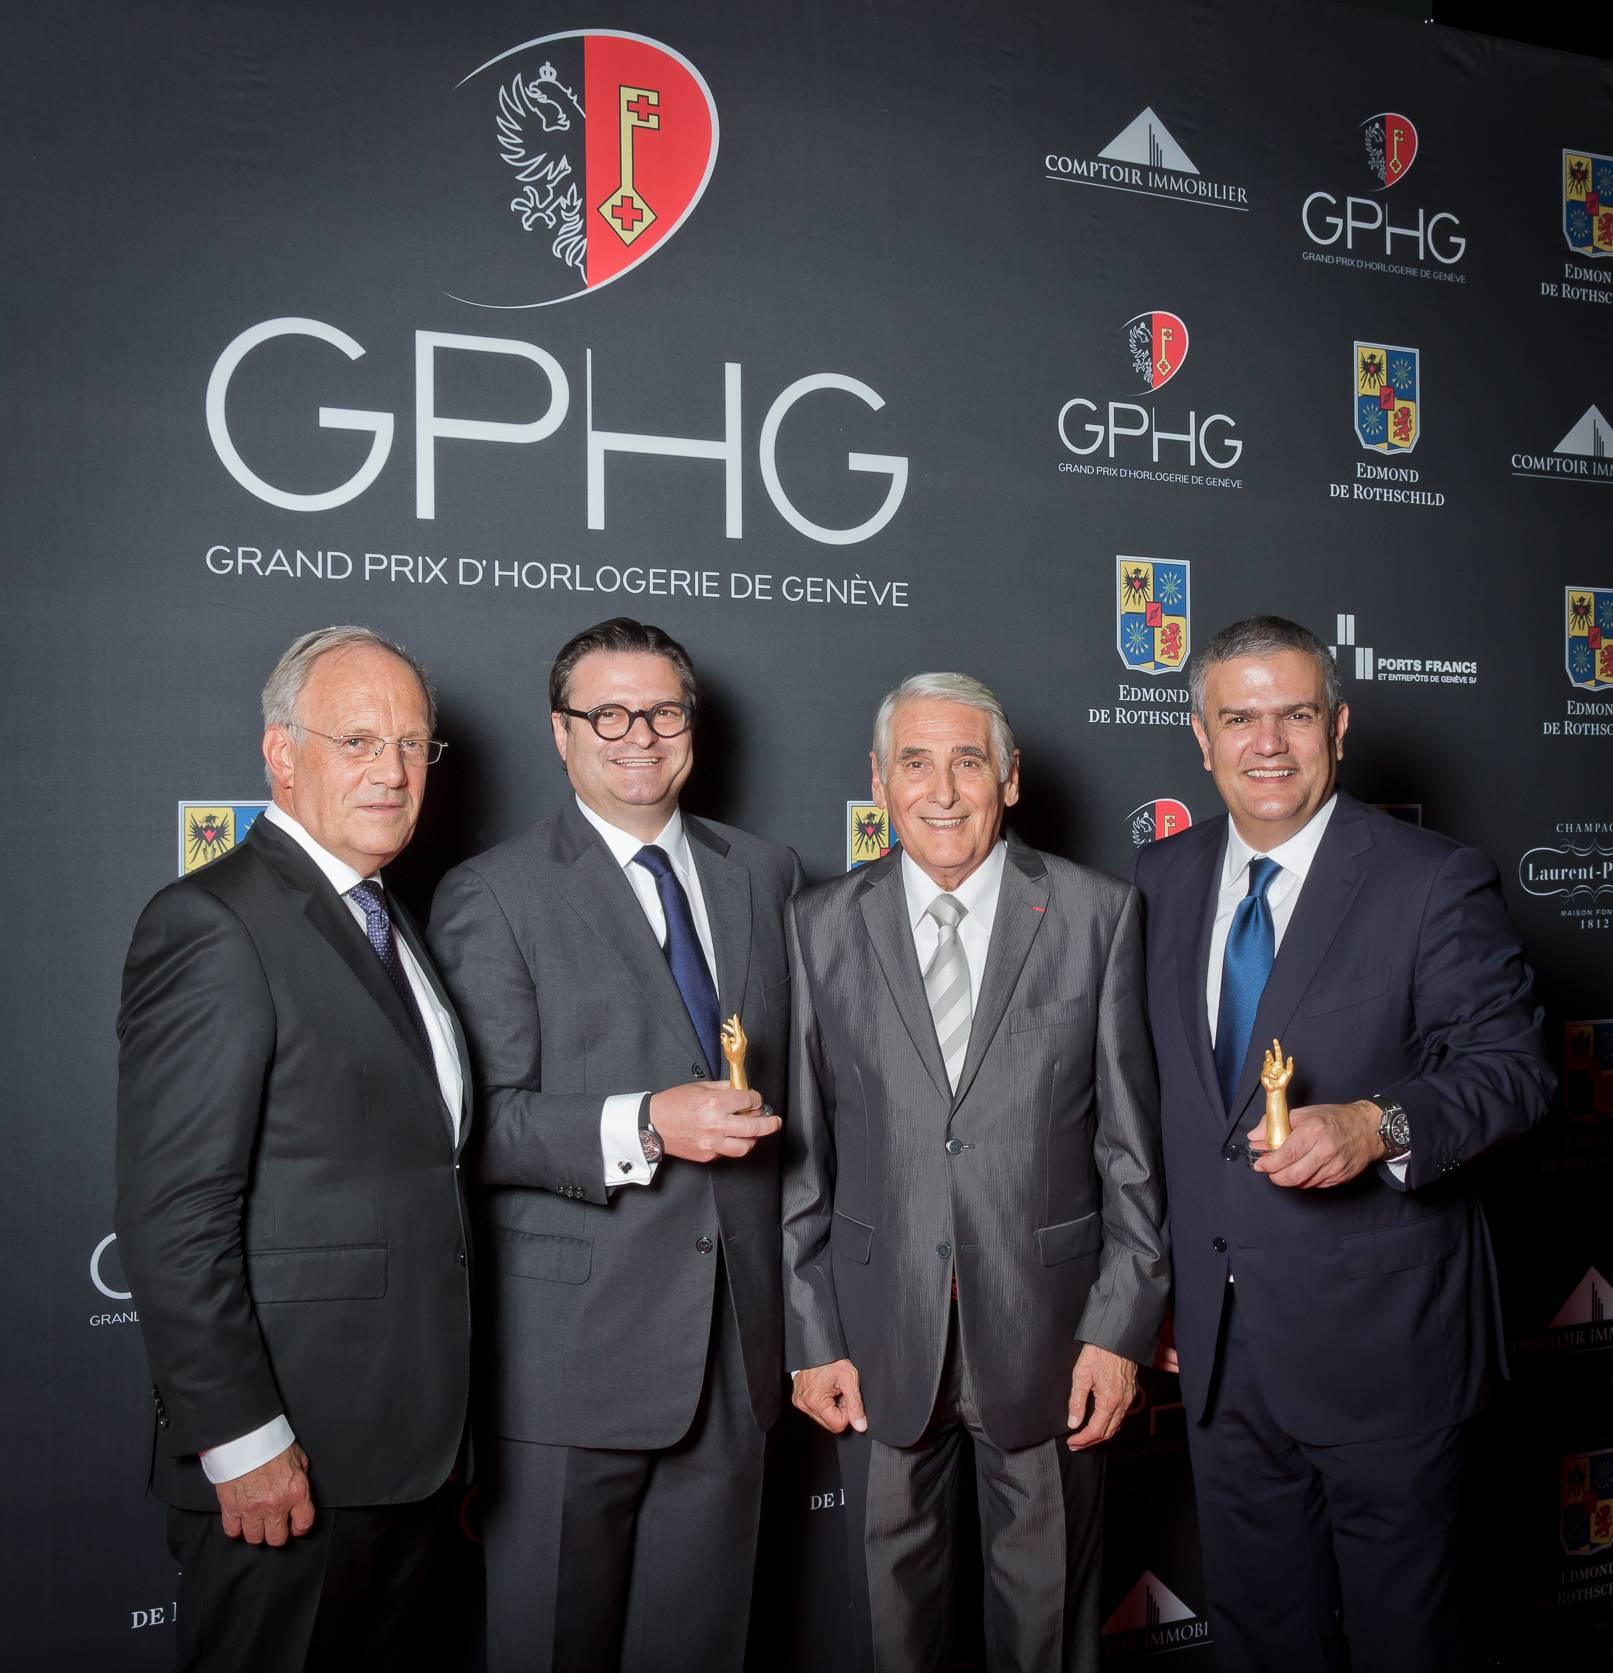 Johann Schneider-Ammann (Federal councillor), Aldo Magada (President & CEO of Zenith, winner of the Sports Watch Prize 2014), Carlo Lamprecht (President of the Foundation of the GPHG) and Ricardo Guadalupe (CEO of Hublot, winner of the Striking Watch Prize 2014)